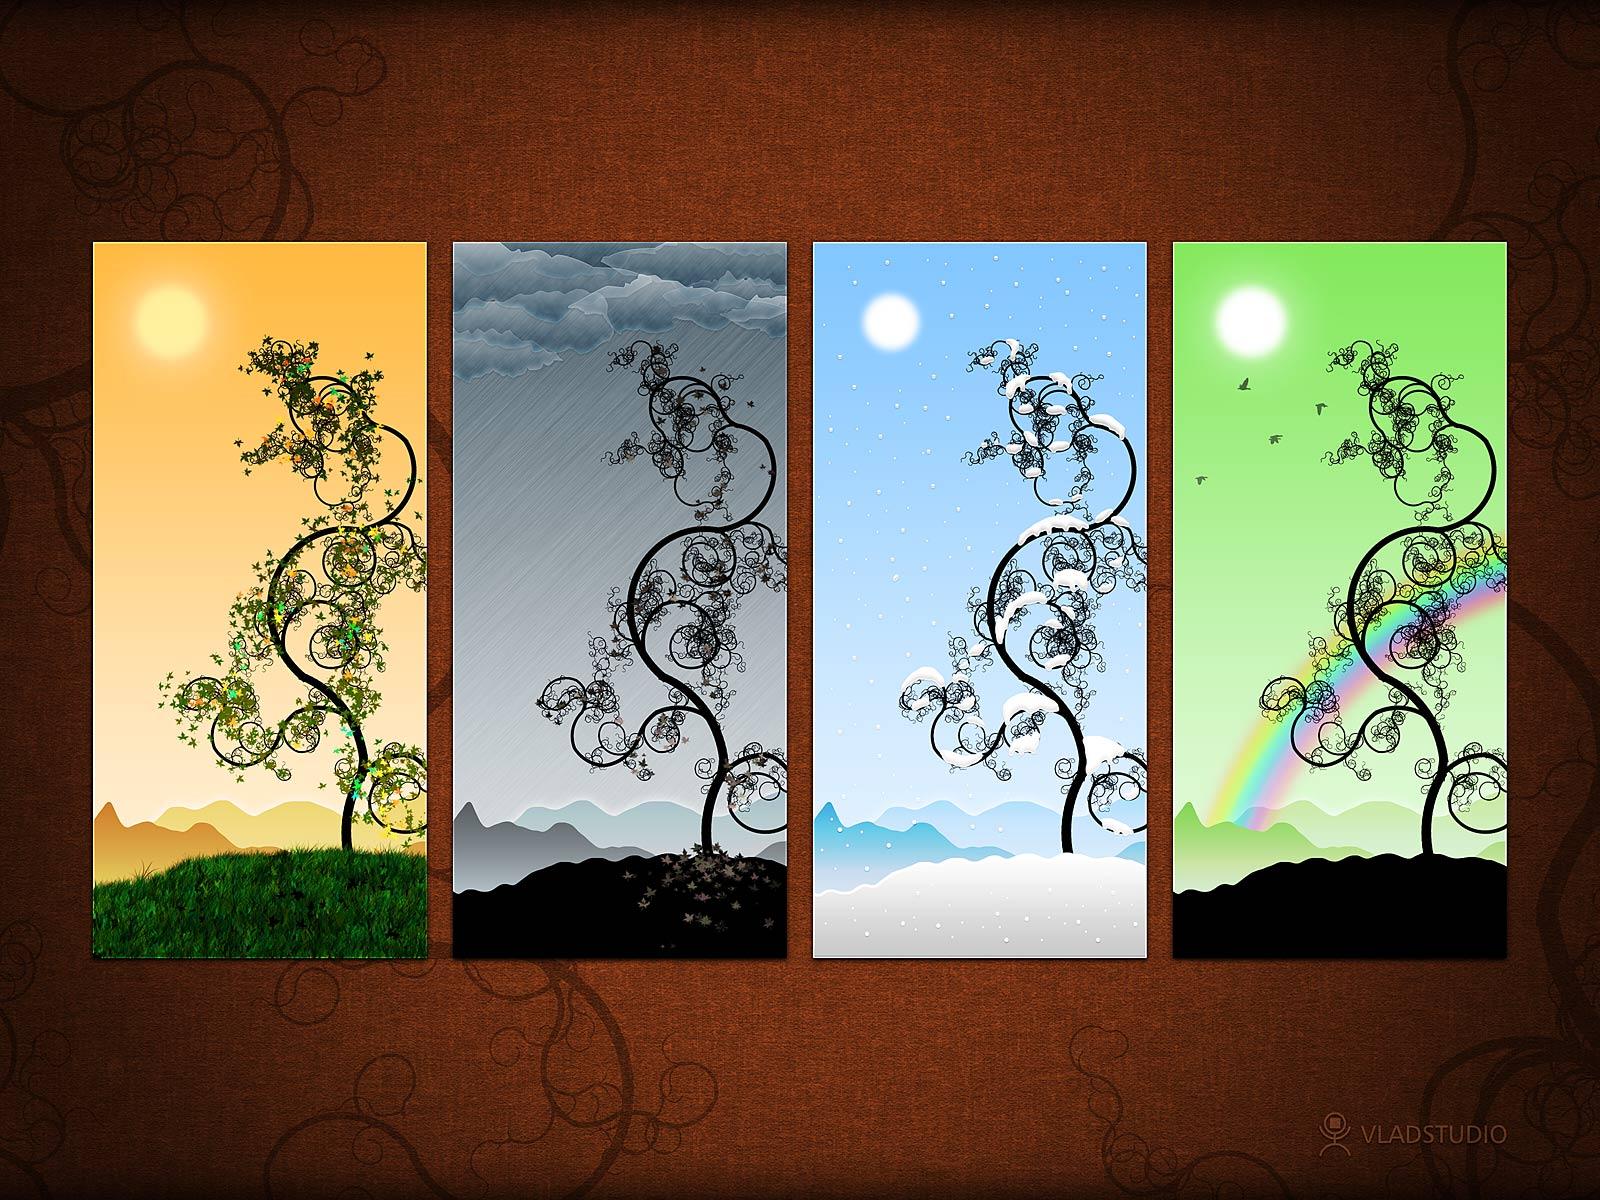 http://2.bp.blogspot.com/-BGQKCUHNKkw/UA6nTW5GrrI/AAAAAAAAA1A/grv8rJtNsLs/s1600/Seasons_by_vladstudio.jpg